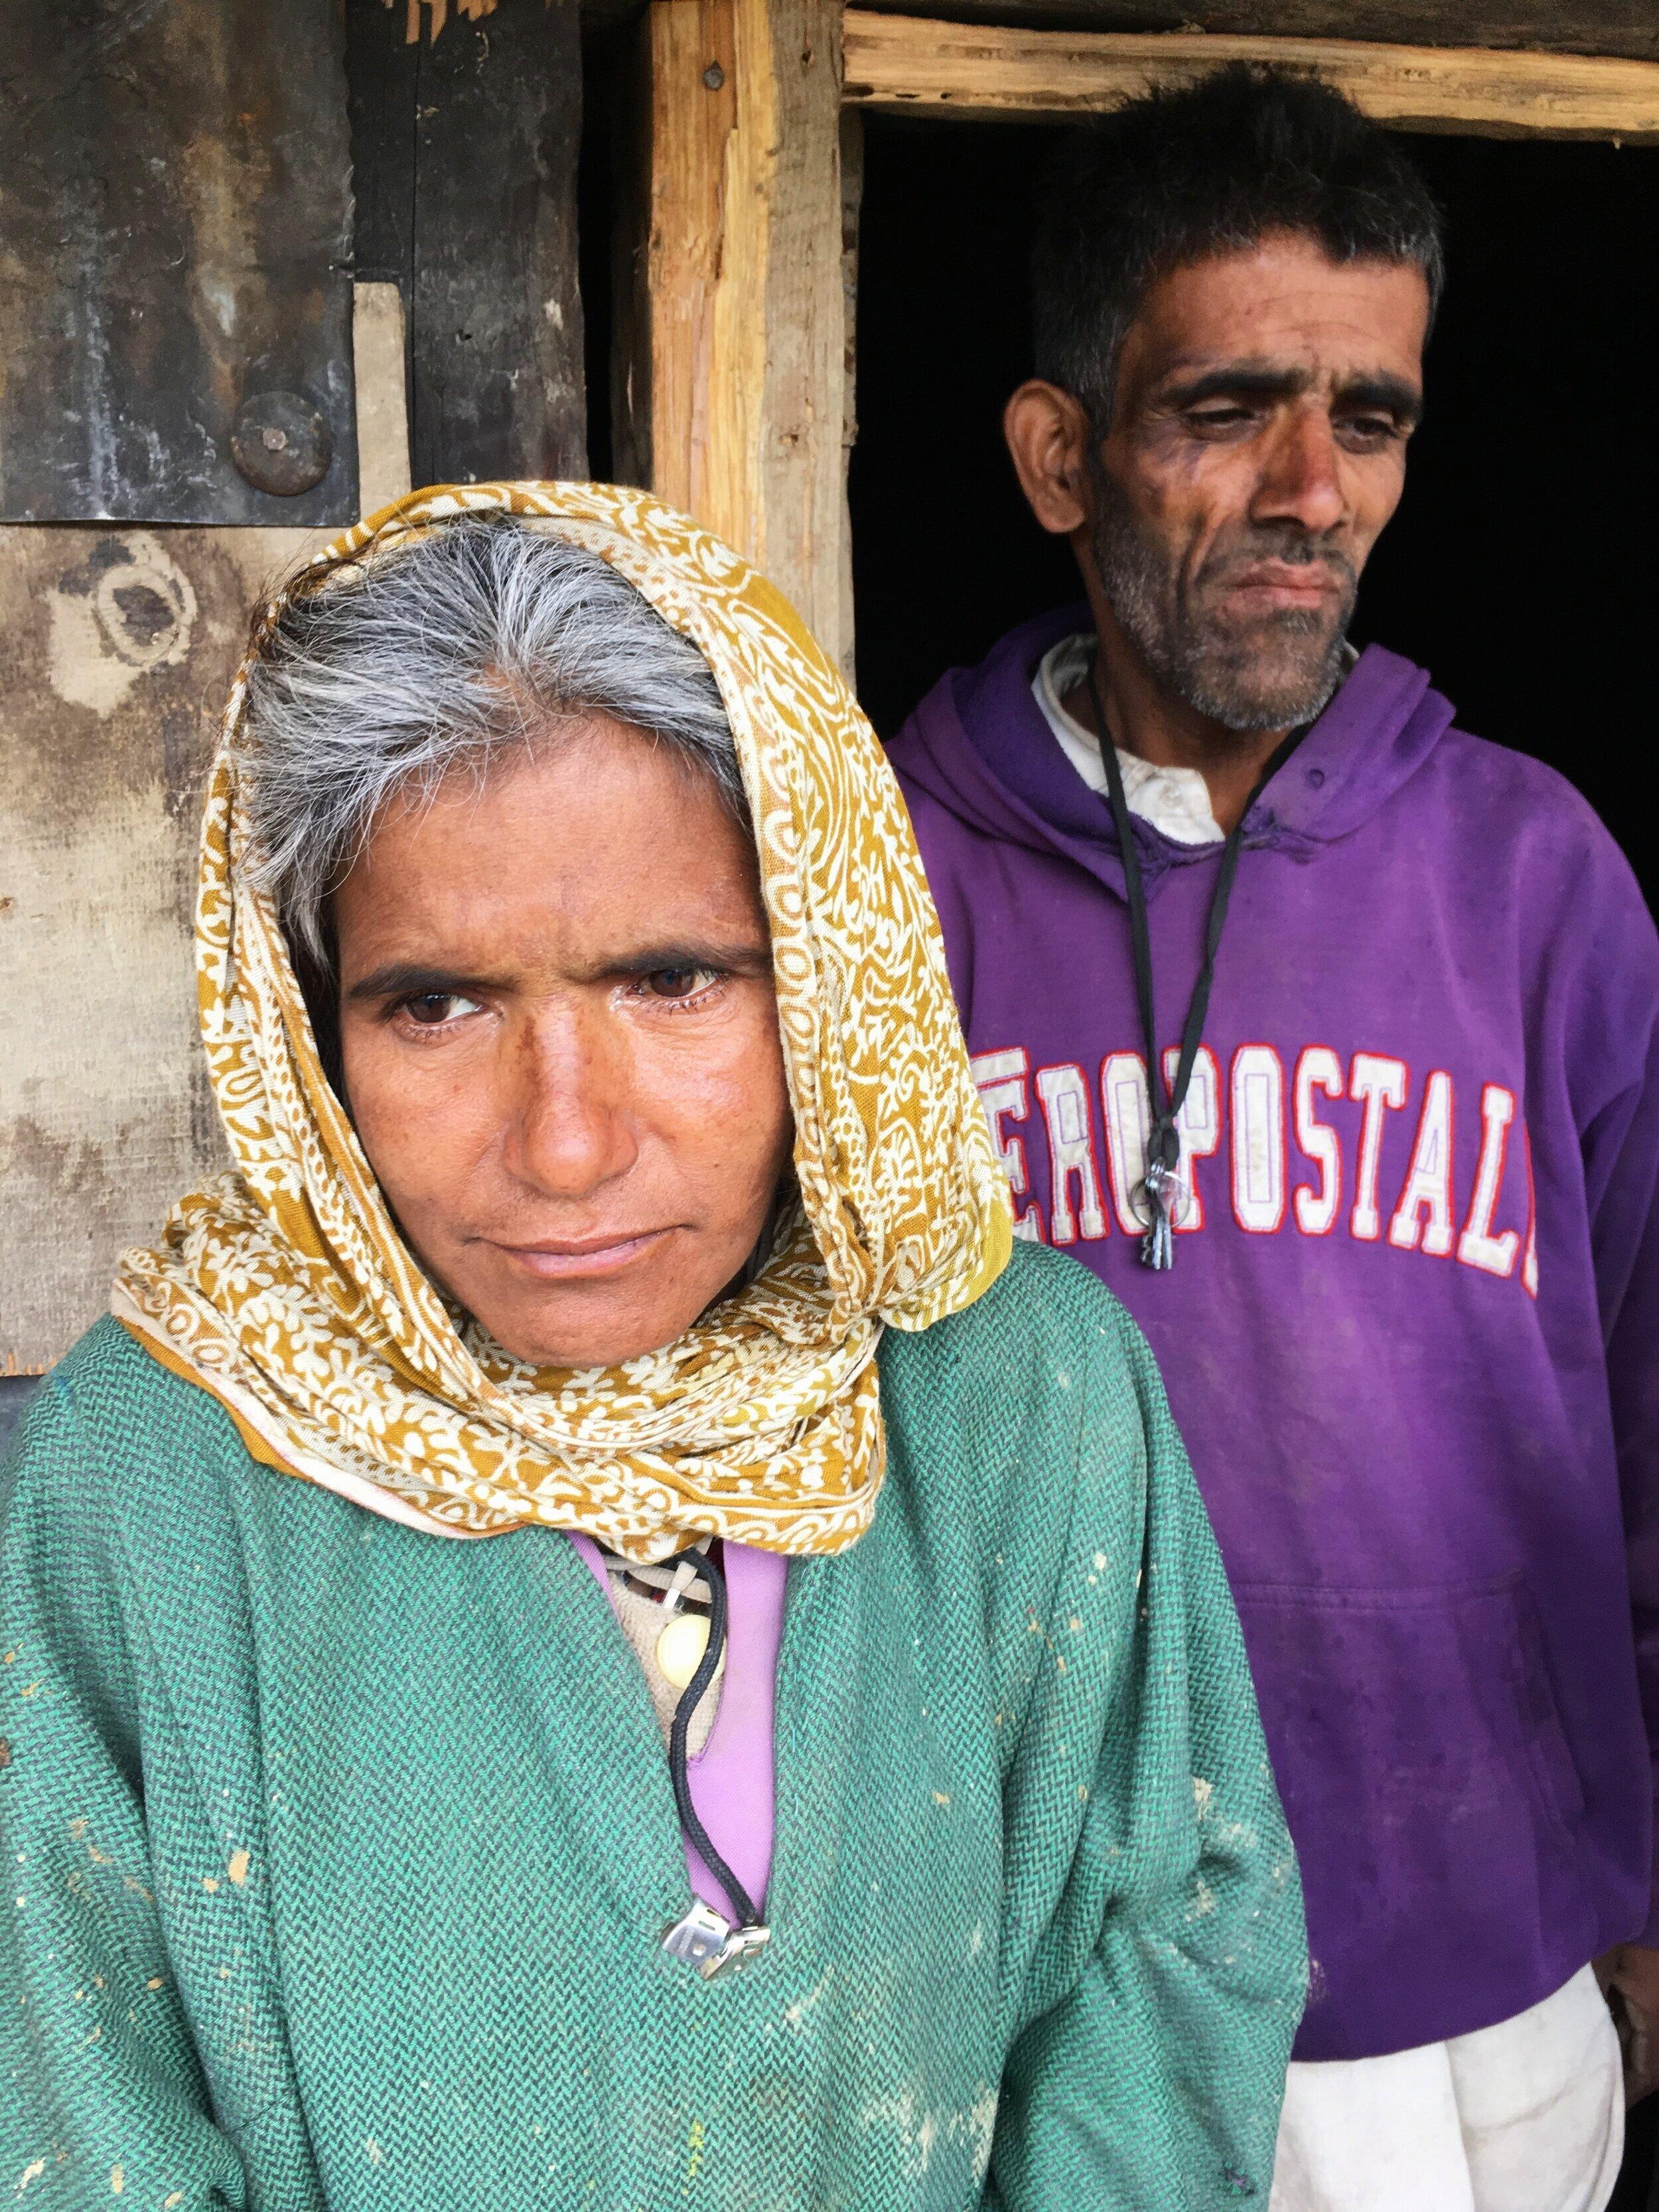 Riyaz's mother Shirina Begum and his uncle